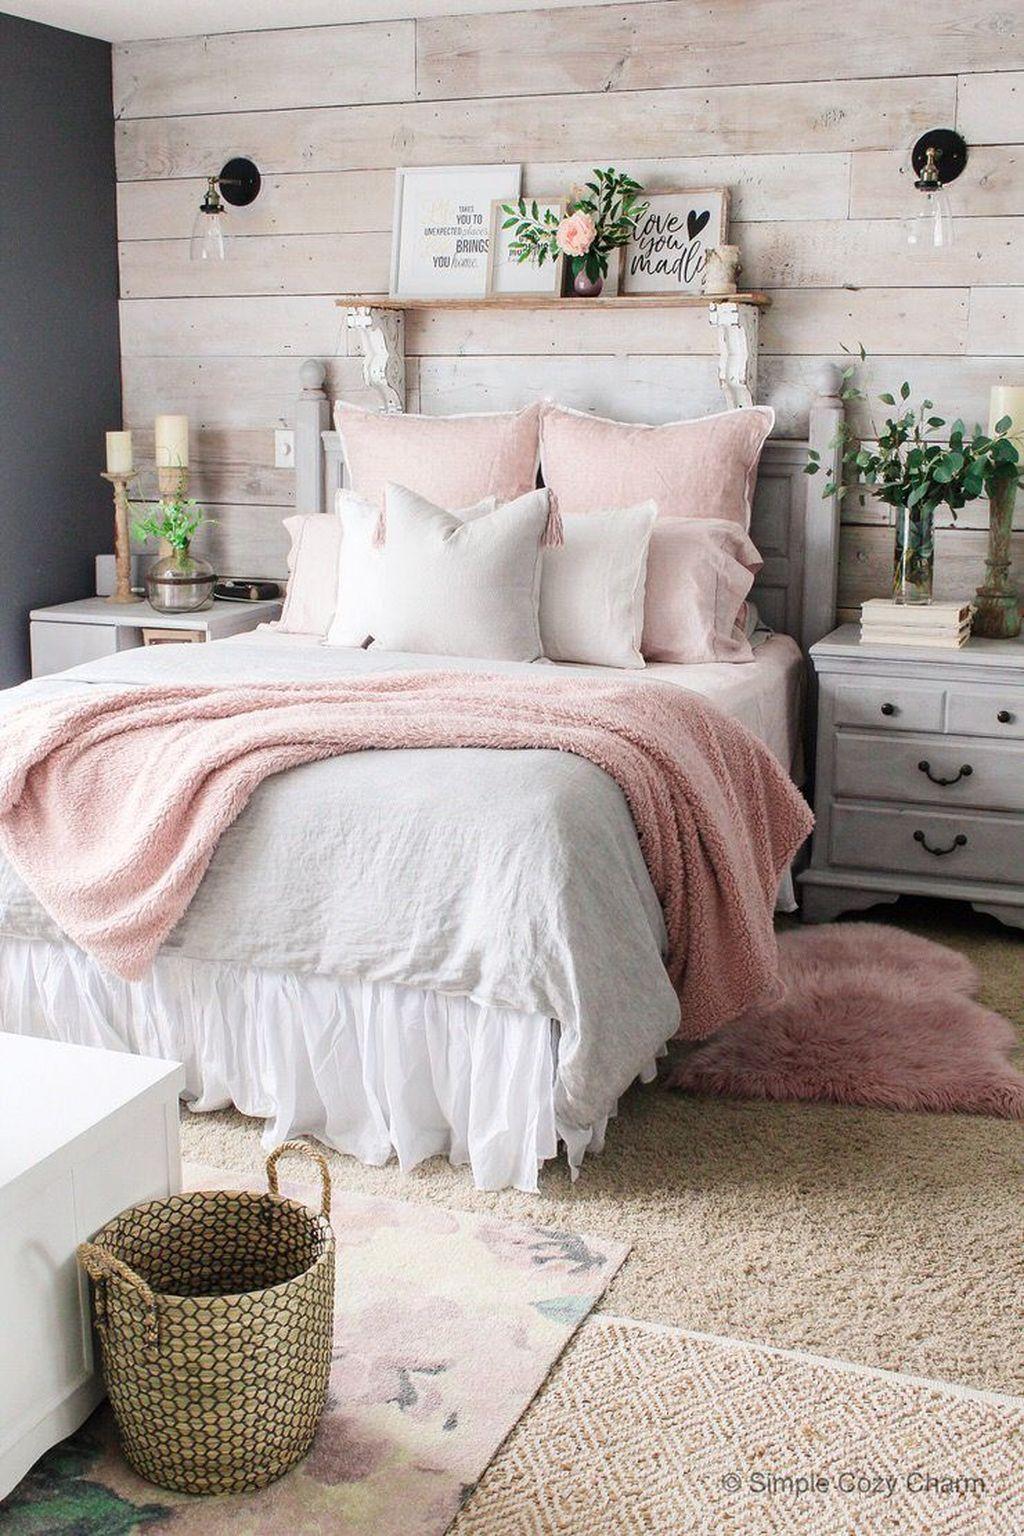 34 Inspiring DIY Bedroom Decor Ideas You Can Try | Bedroom ...